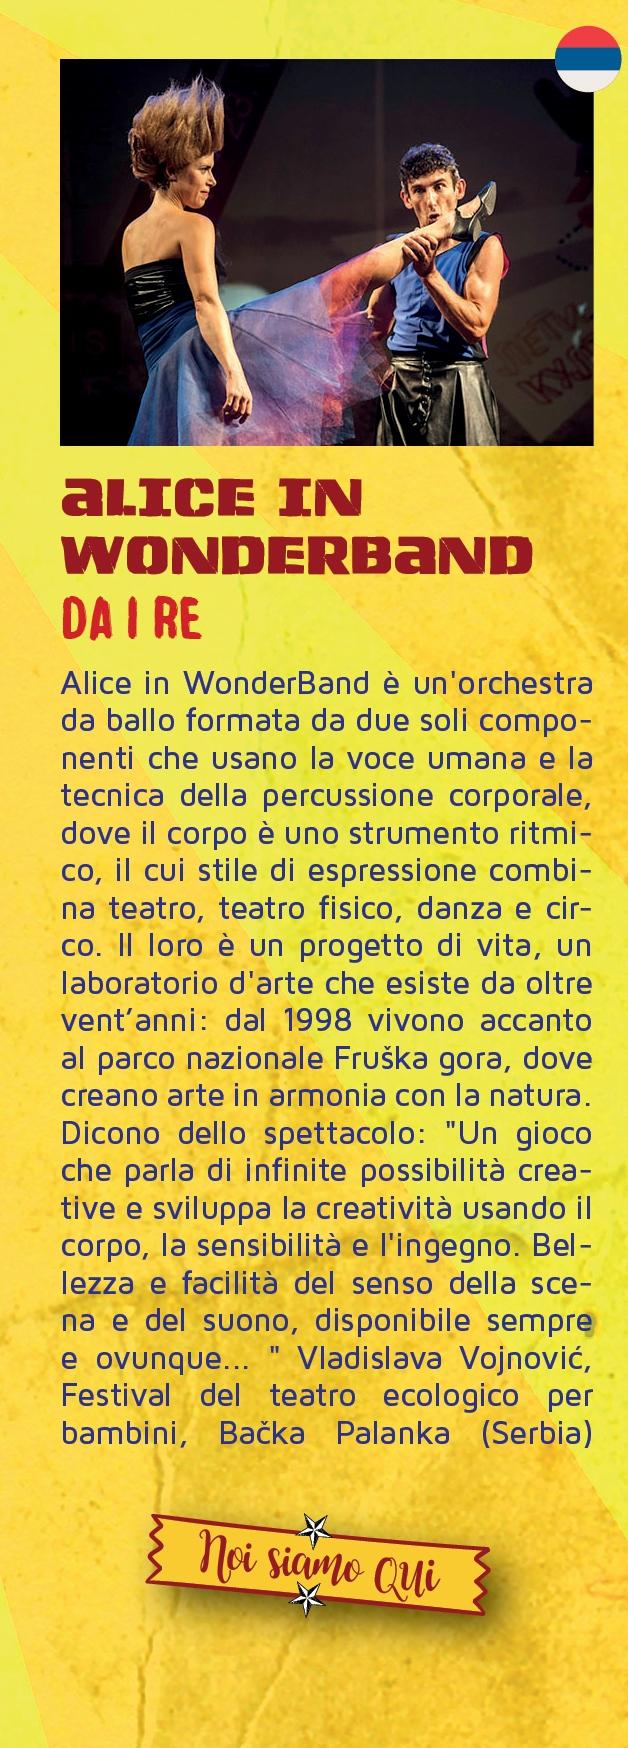 ALICE+IN+WONDERBAND.jpg